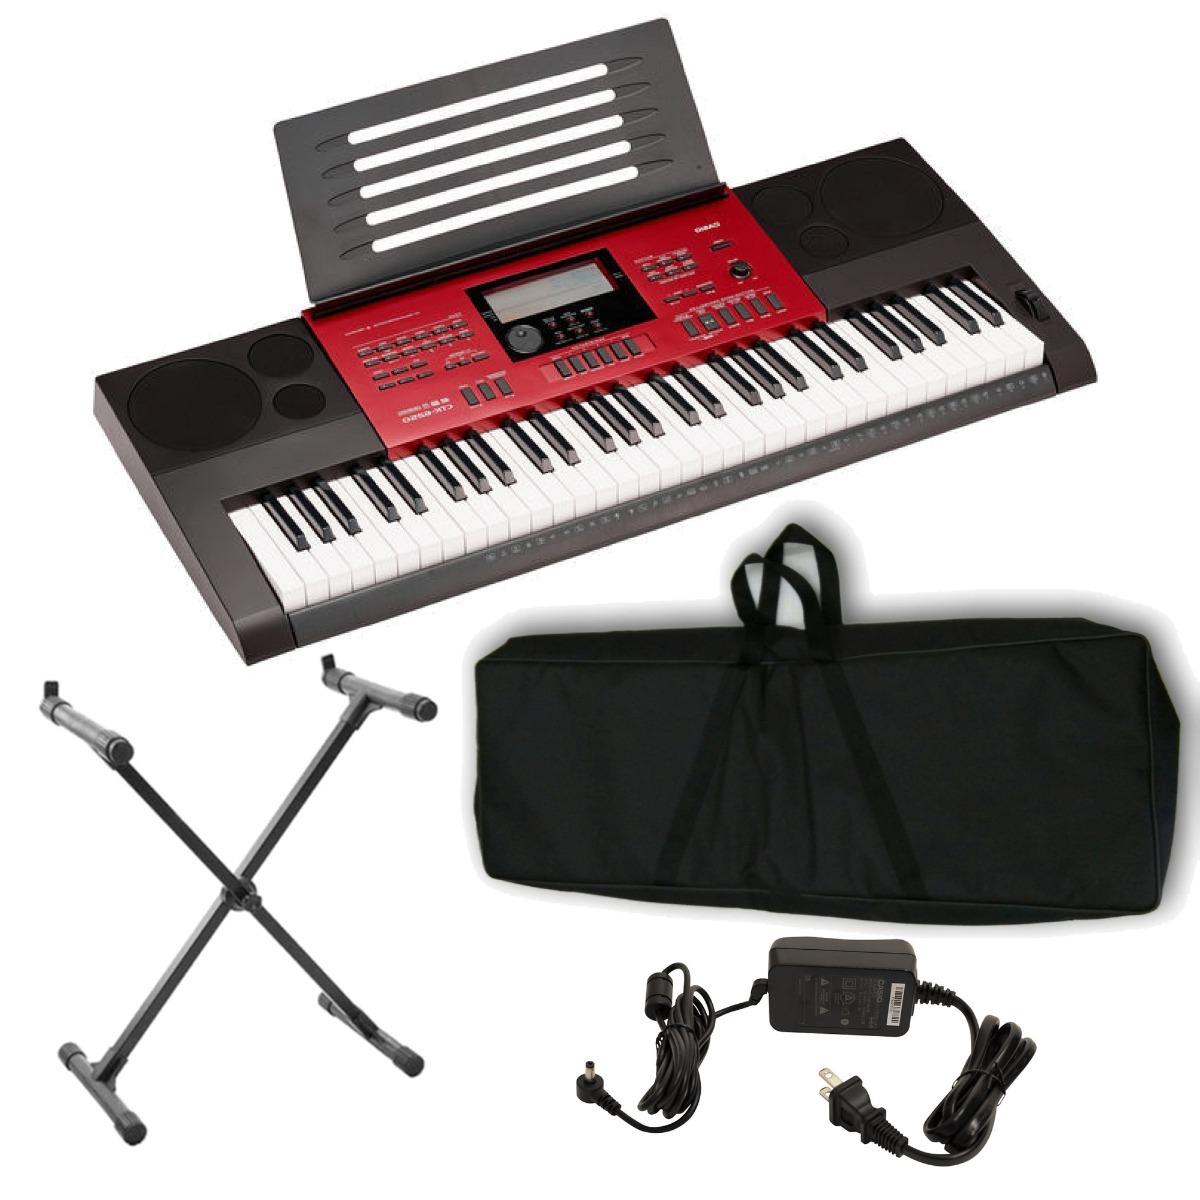 a627d7001c9 teclado casio digital ctk-6250 61 teclas + kit6l. Carregando zoom.